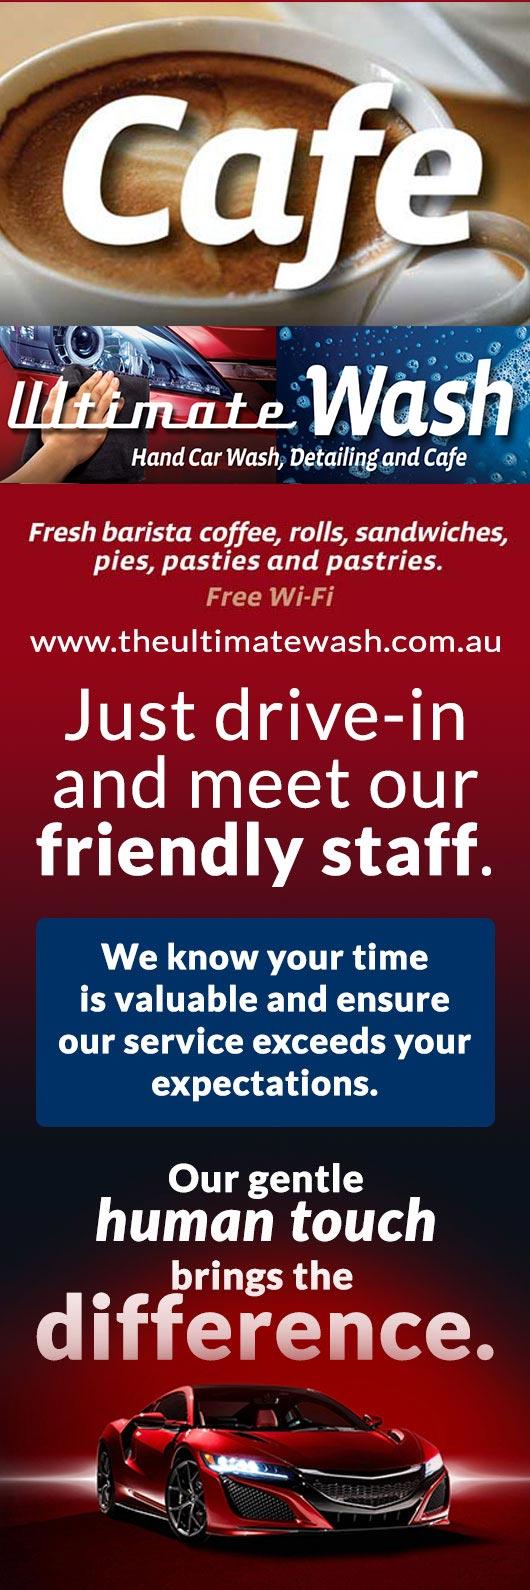 Ultimate wash cafe promotion